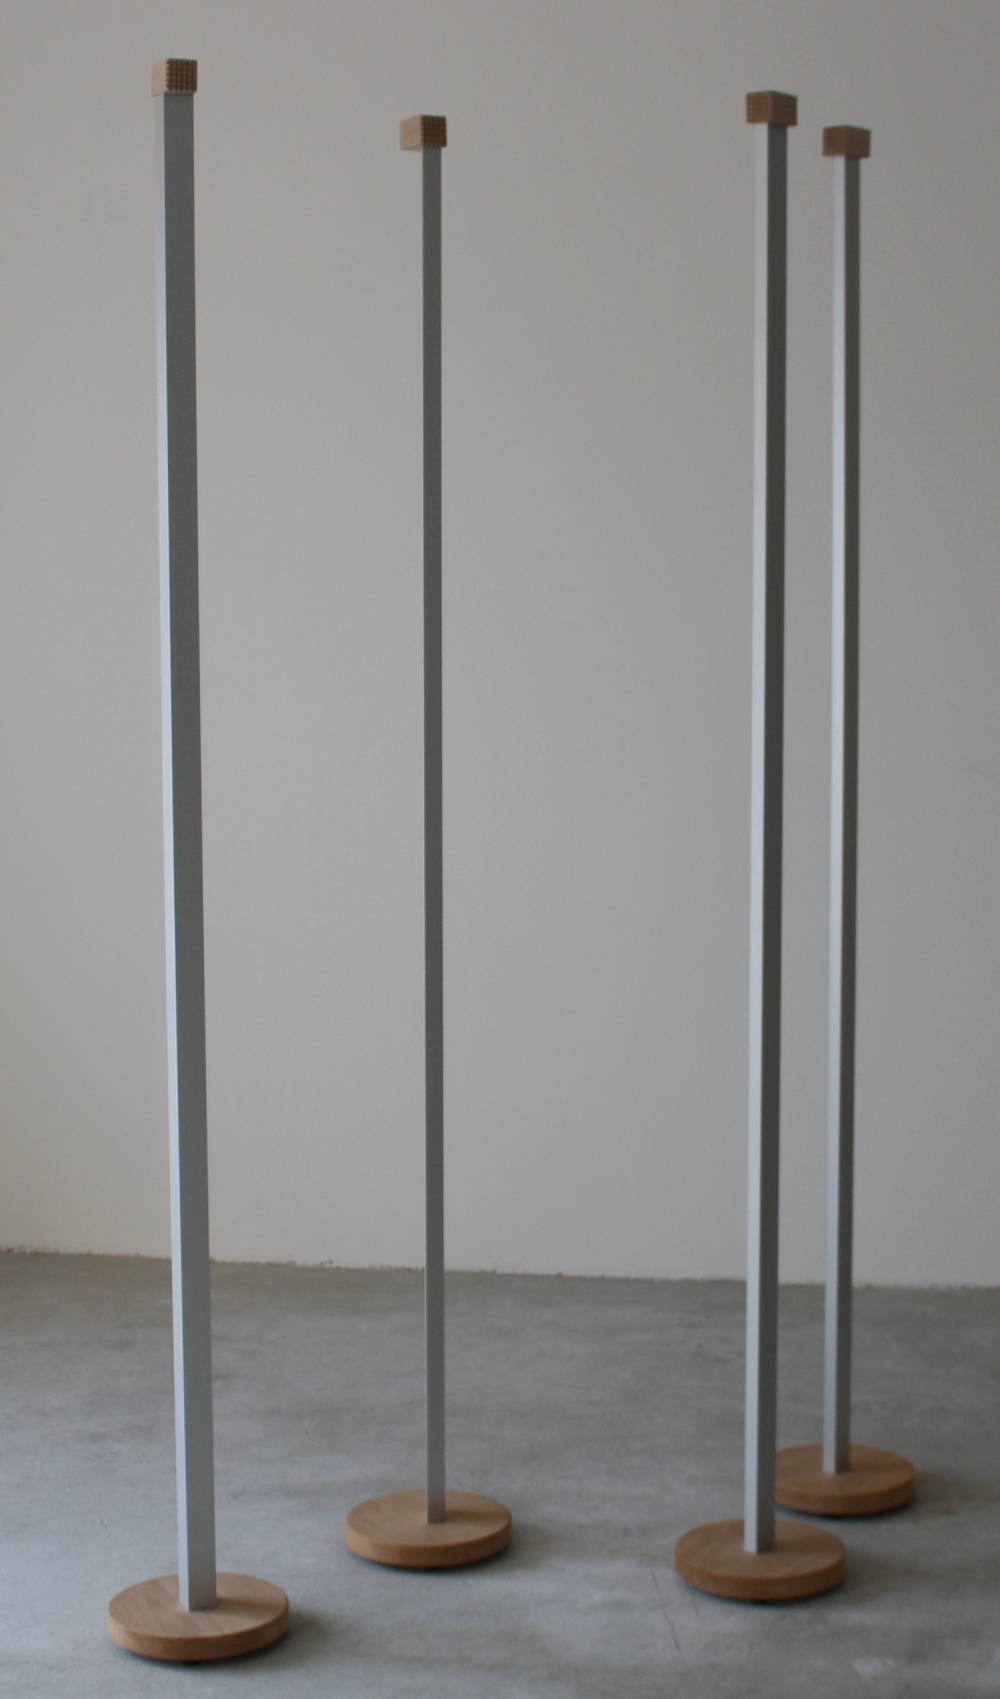 15.Tomáš Hlavina   Palice   2010, aluminiové profily, dřevo   90 x 90 cm